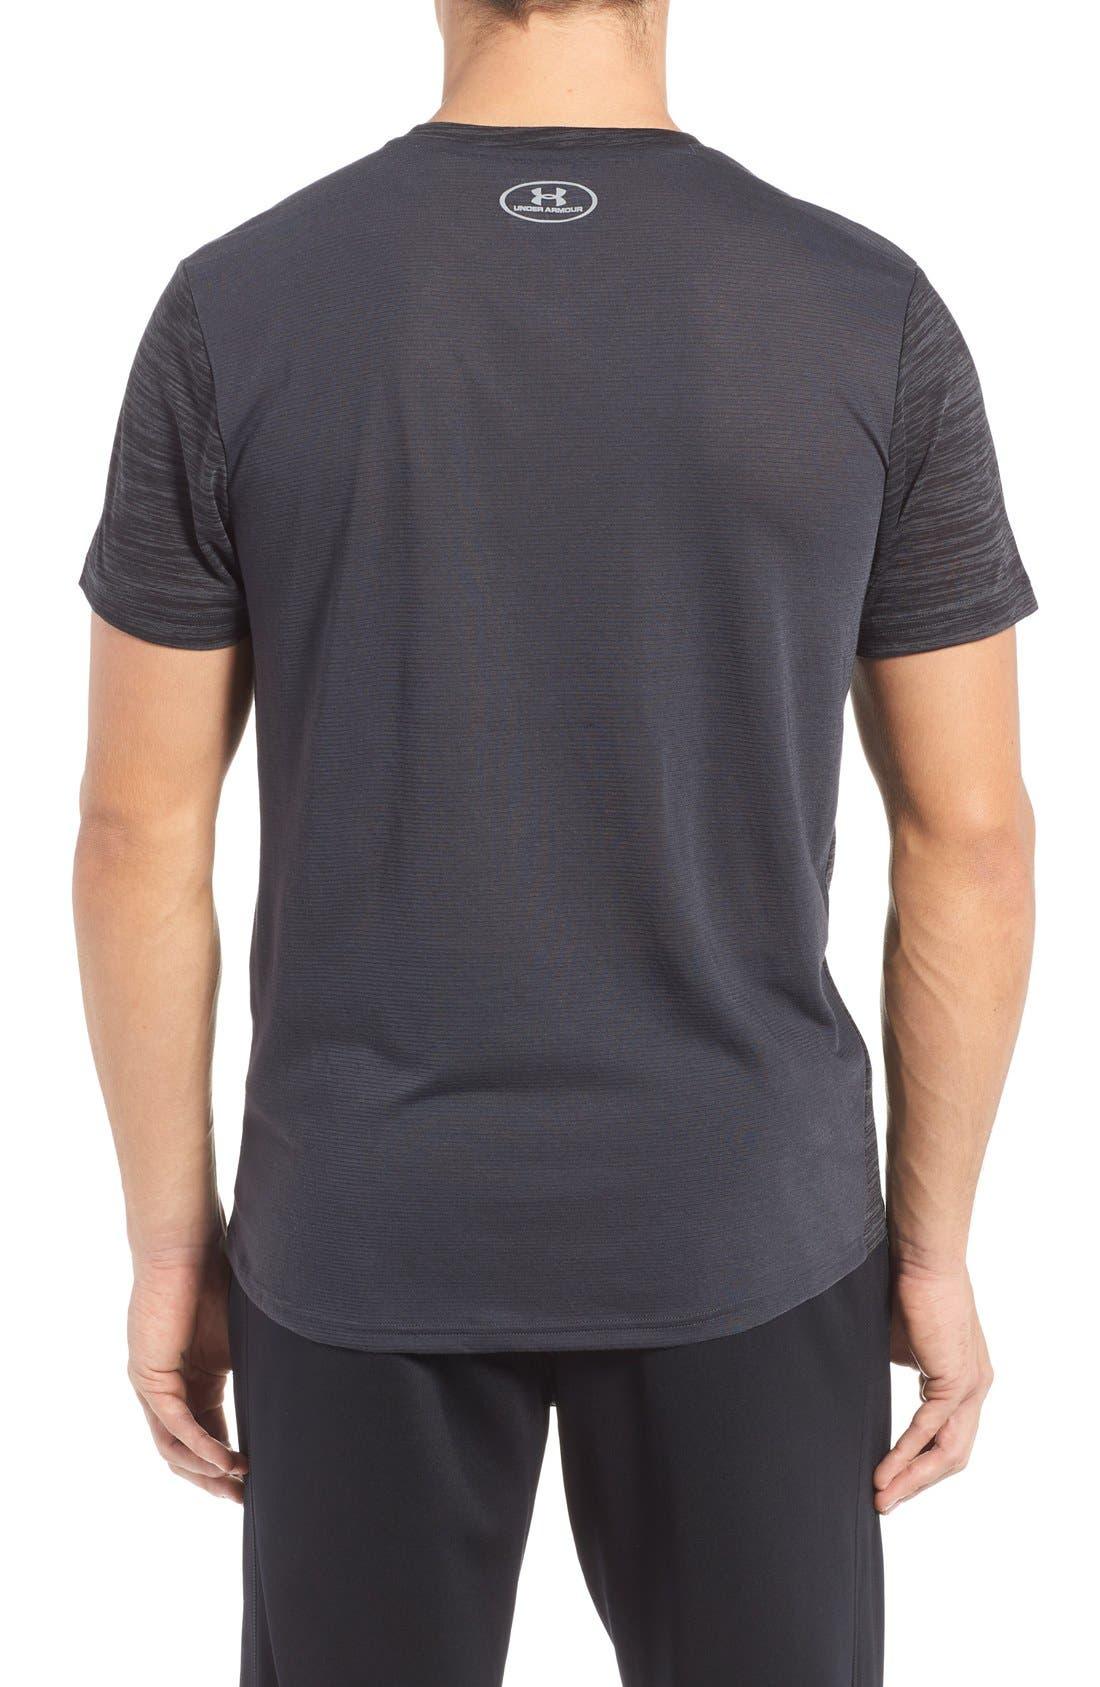 Alternate Image 2  - Under Armour 'Streaker Run' Microthread V-Neck T-Shirt